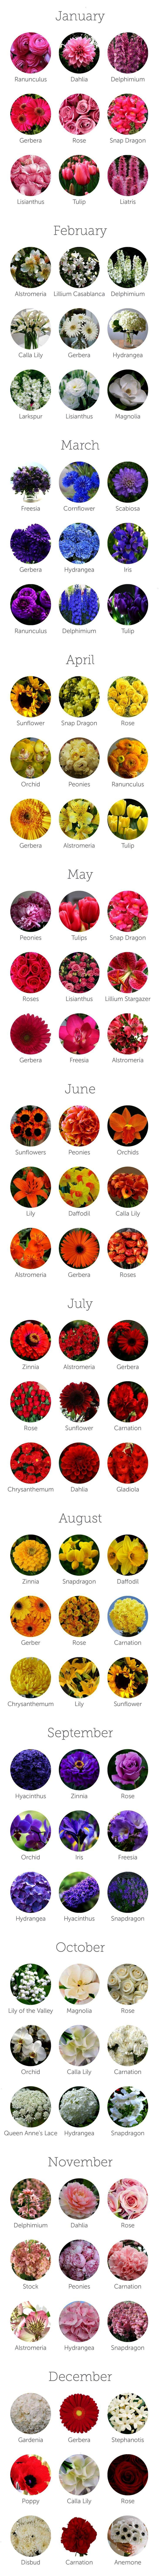 56 best Wedding Flowers Decor images on Pinterest